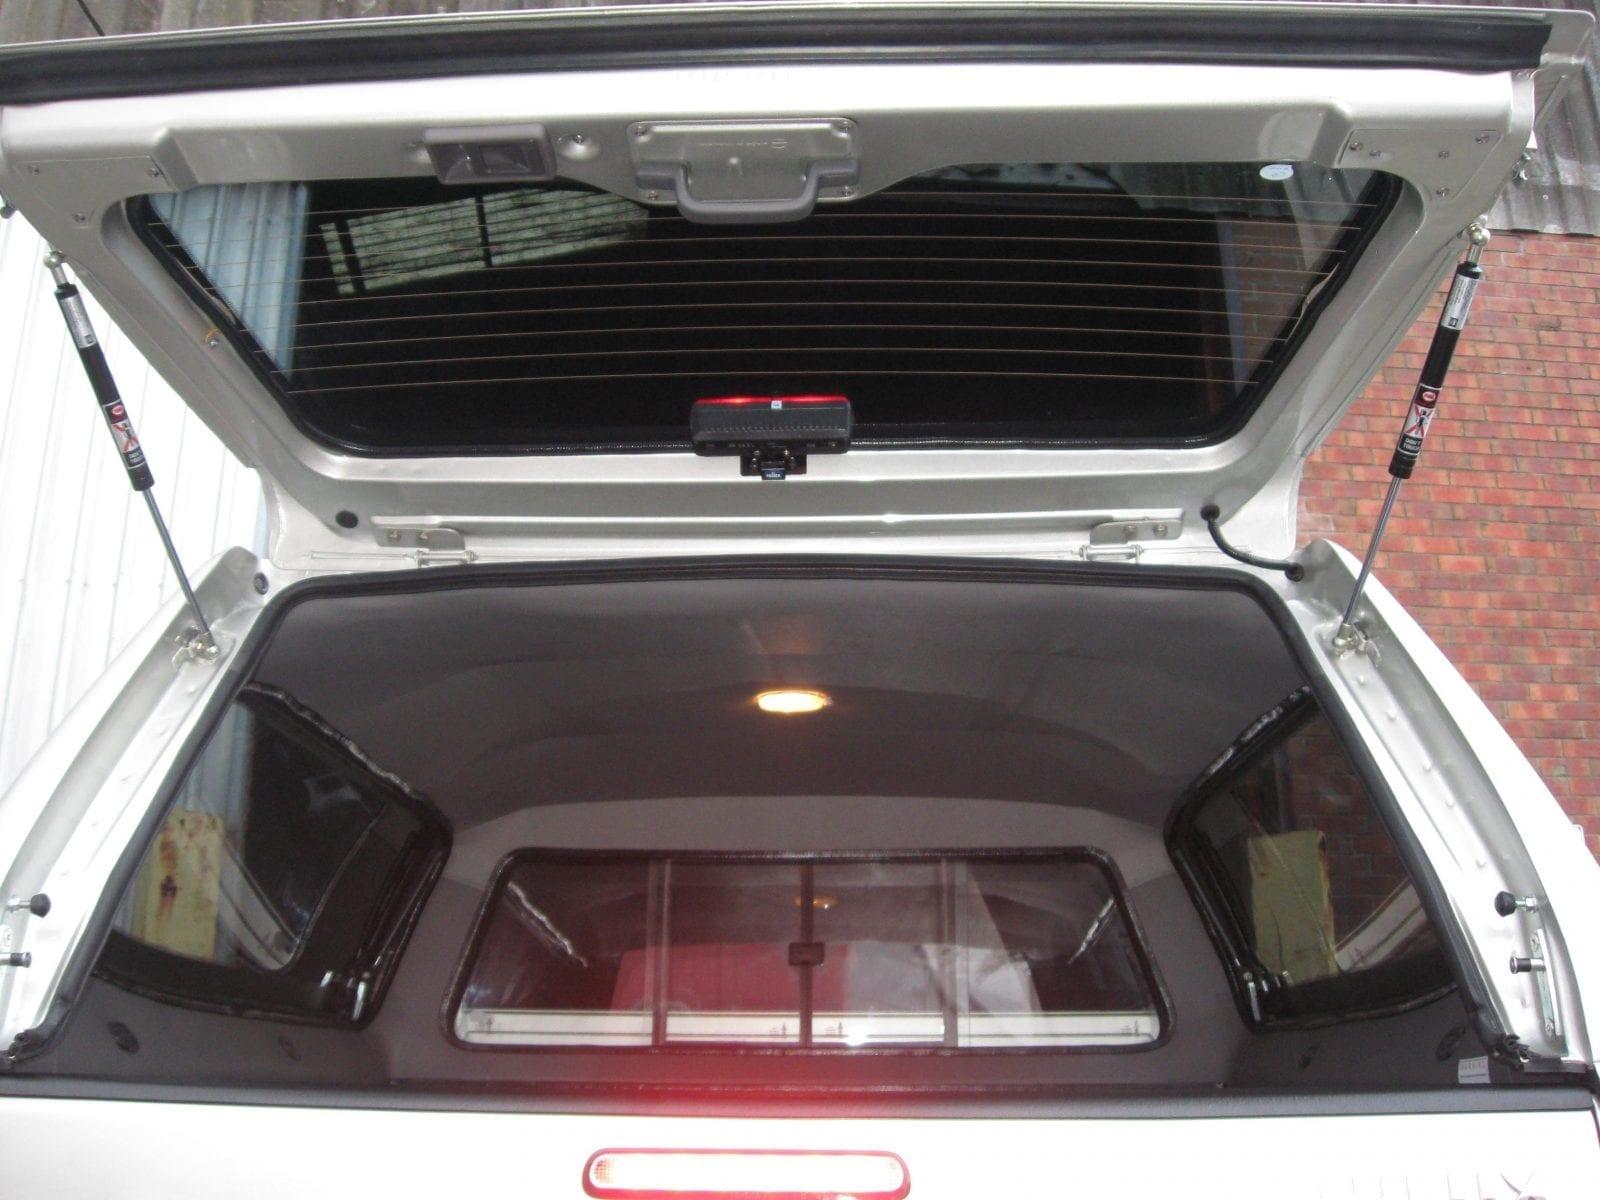 razorback-canopy-9 & razorback-canopy-9 | u2013 Loadrail